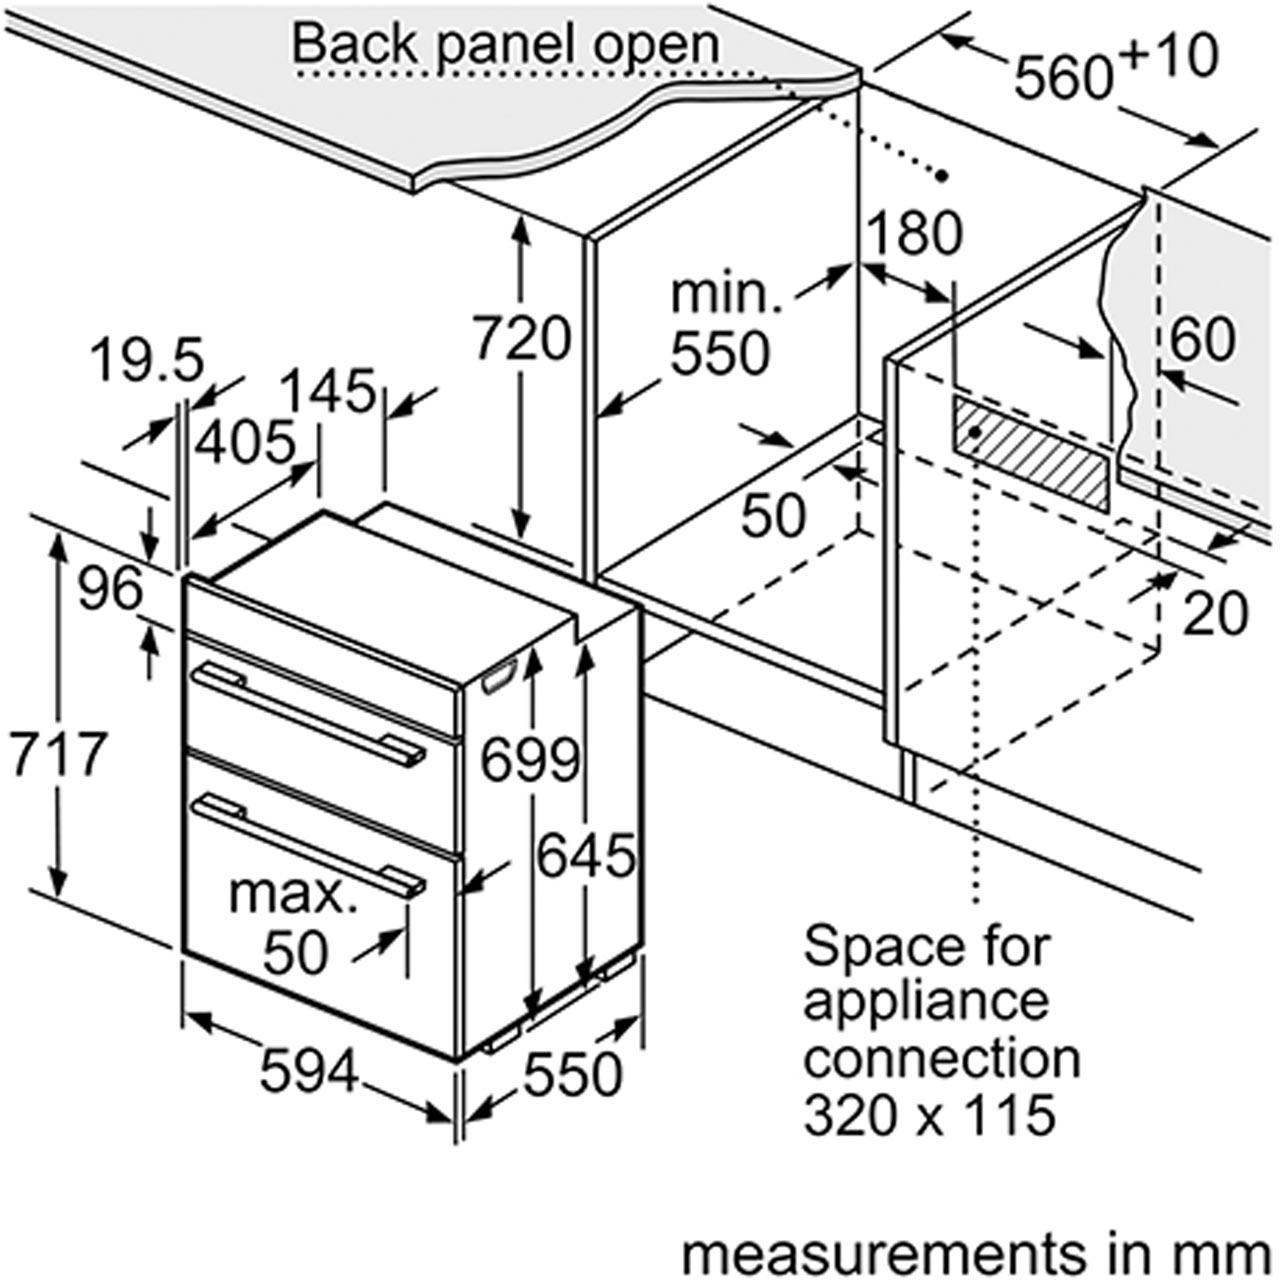 Awesome bosch smu2042 dishwasher wiring diagram illustration